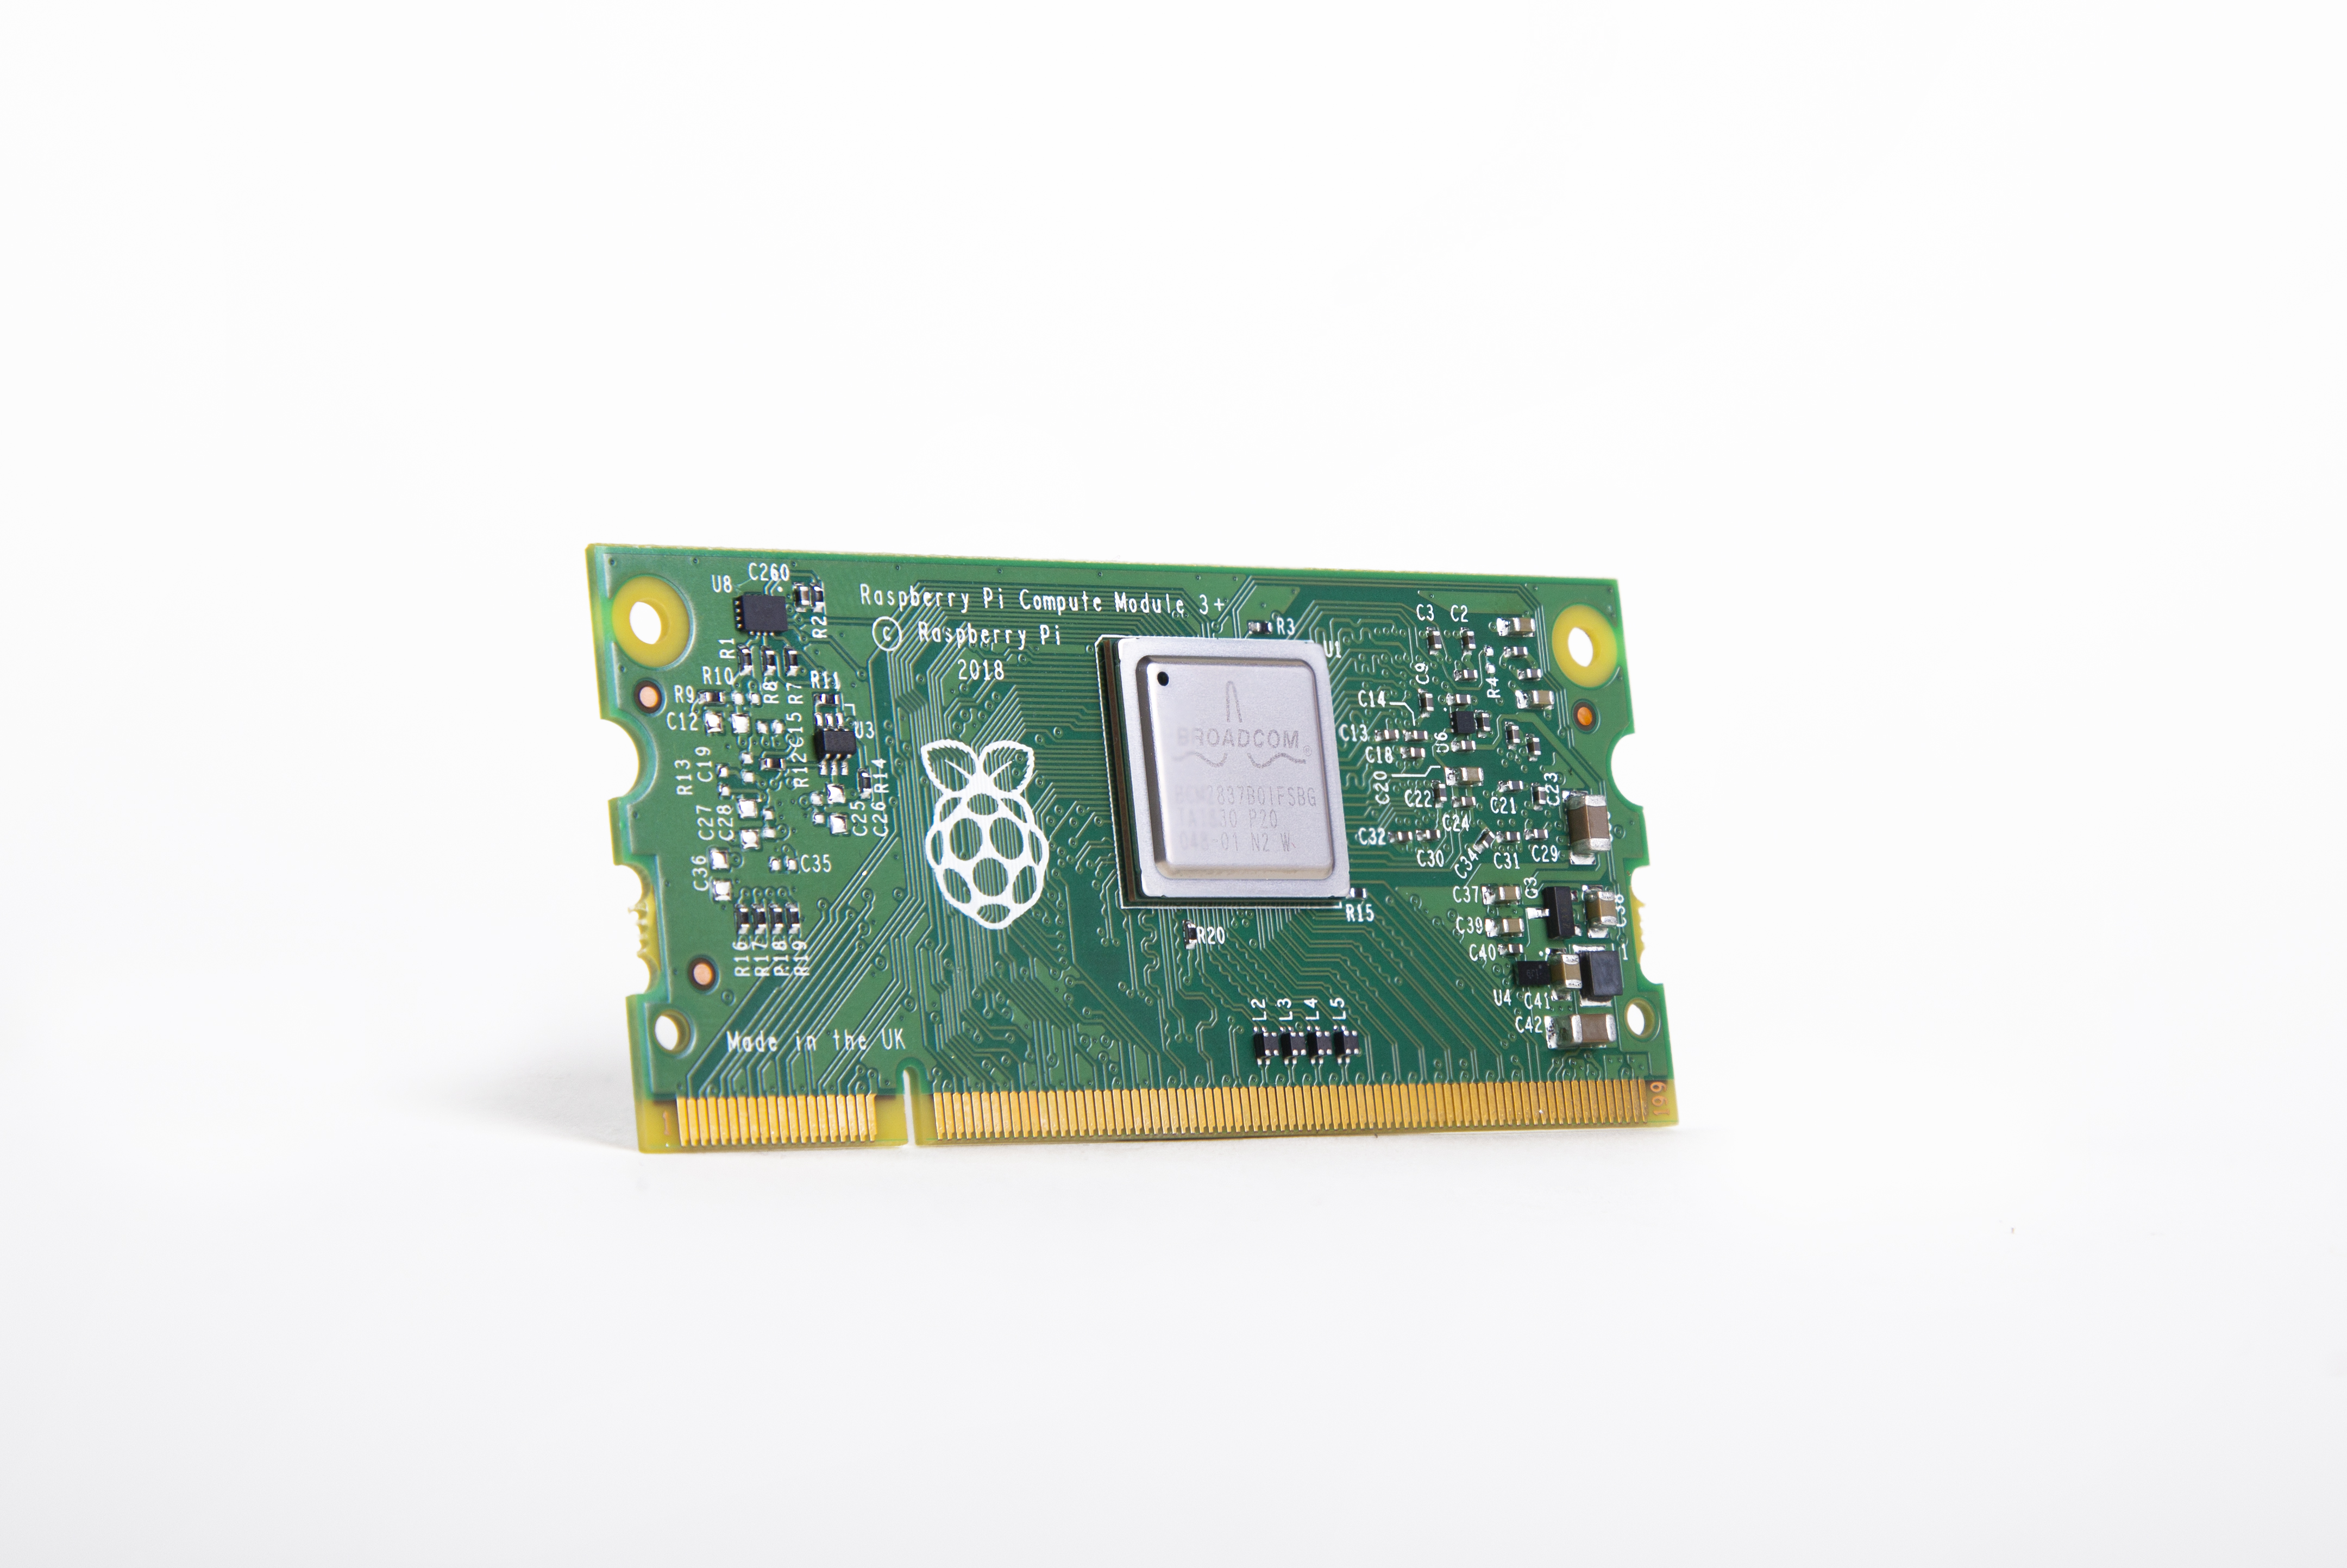 Raspberry Pi(ラズベリーパイ)コンピュートモジュール3 + 32GB